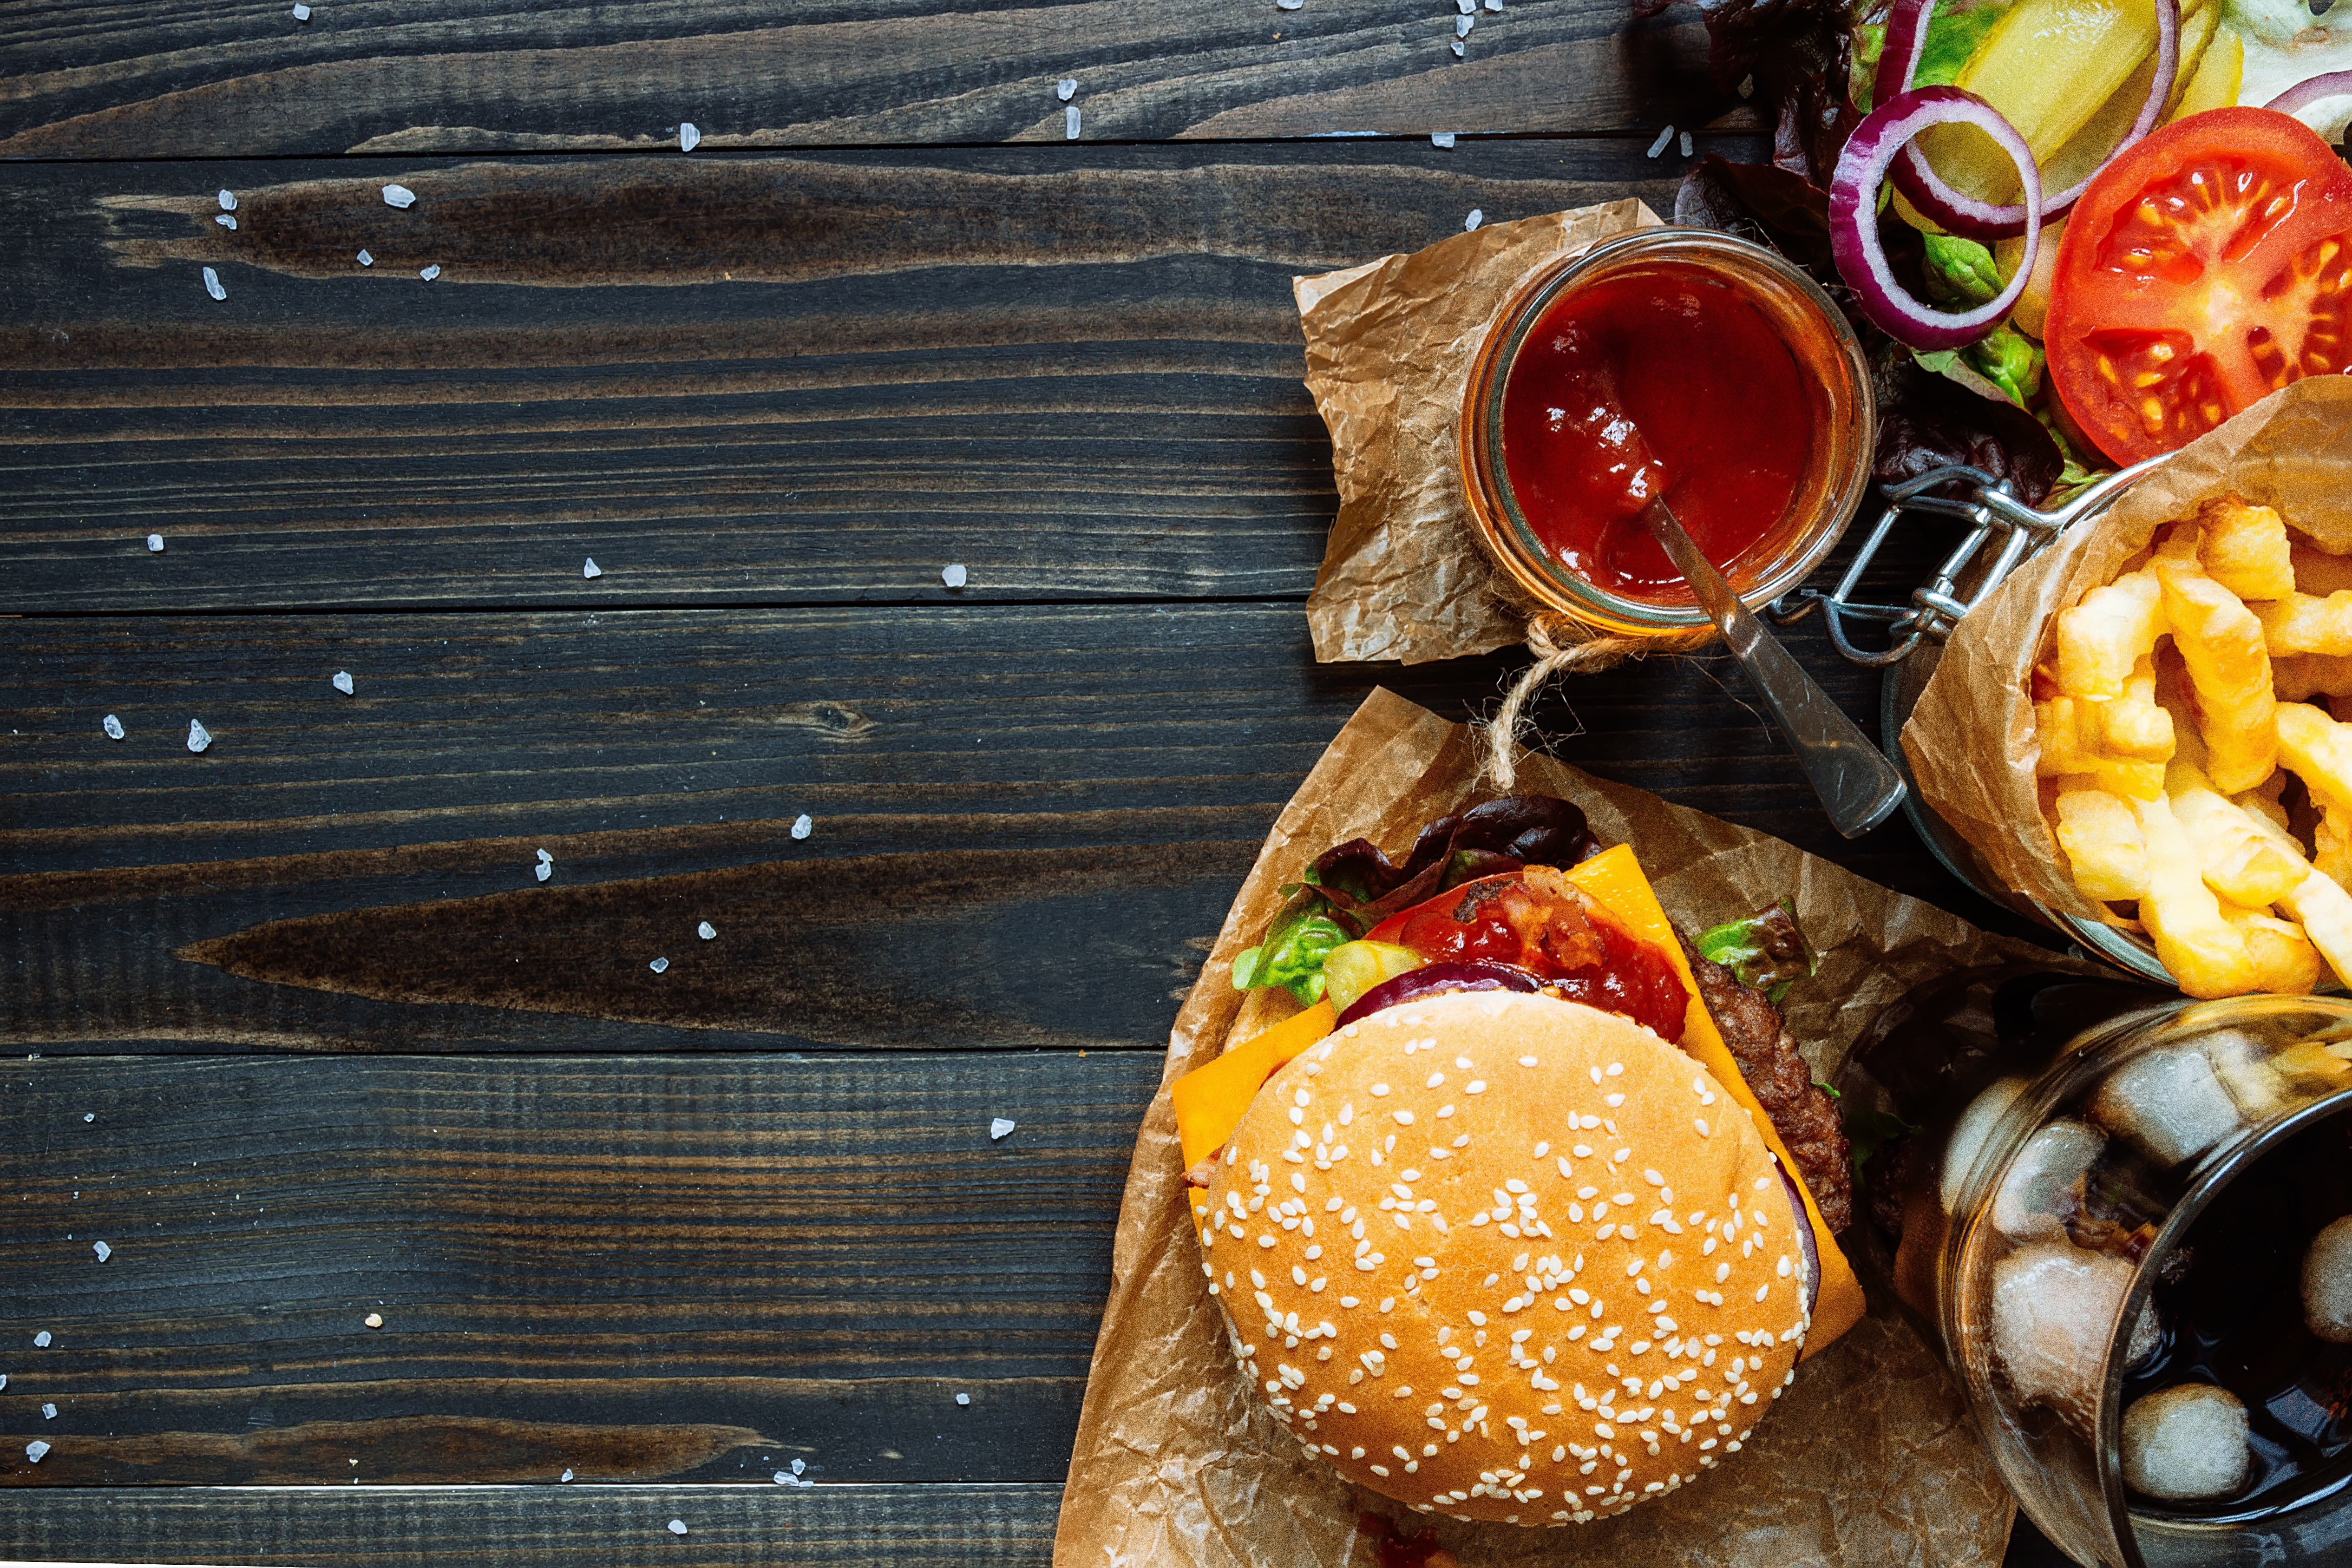 Burger 4k Ultra Hd Wallpaper Background Image 5063x3375 Id 922691 Wallpaper Abyss